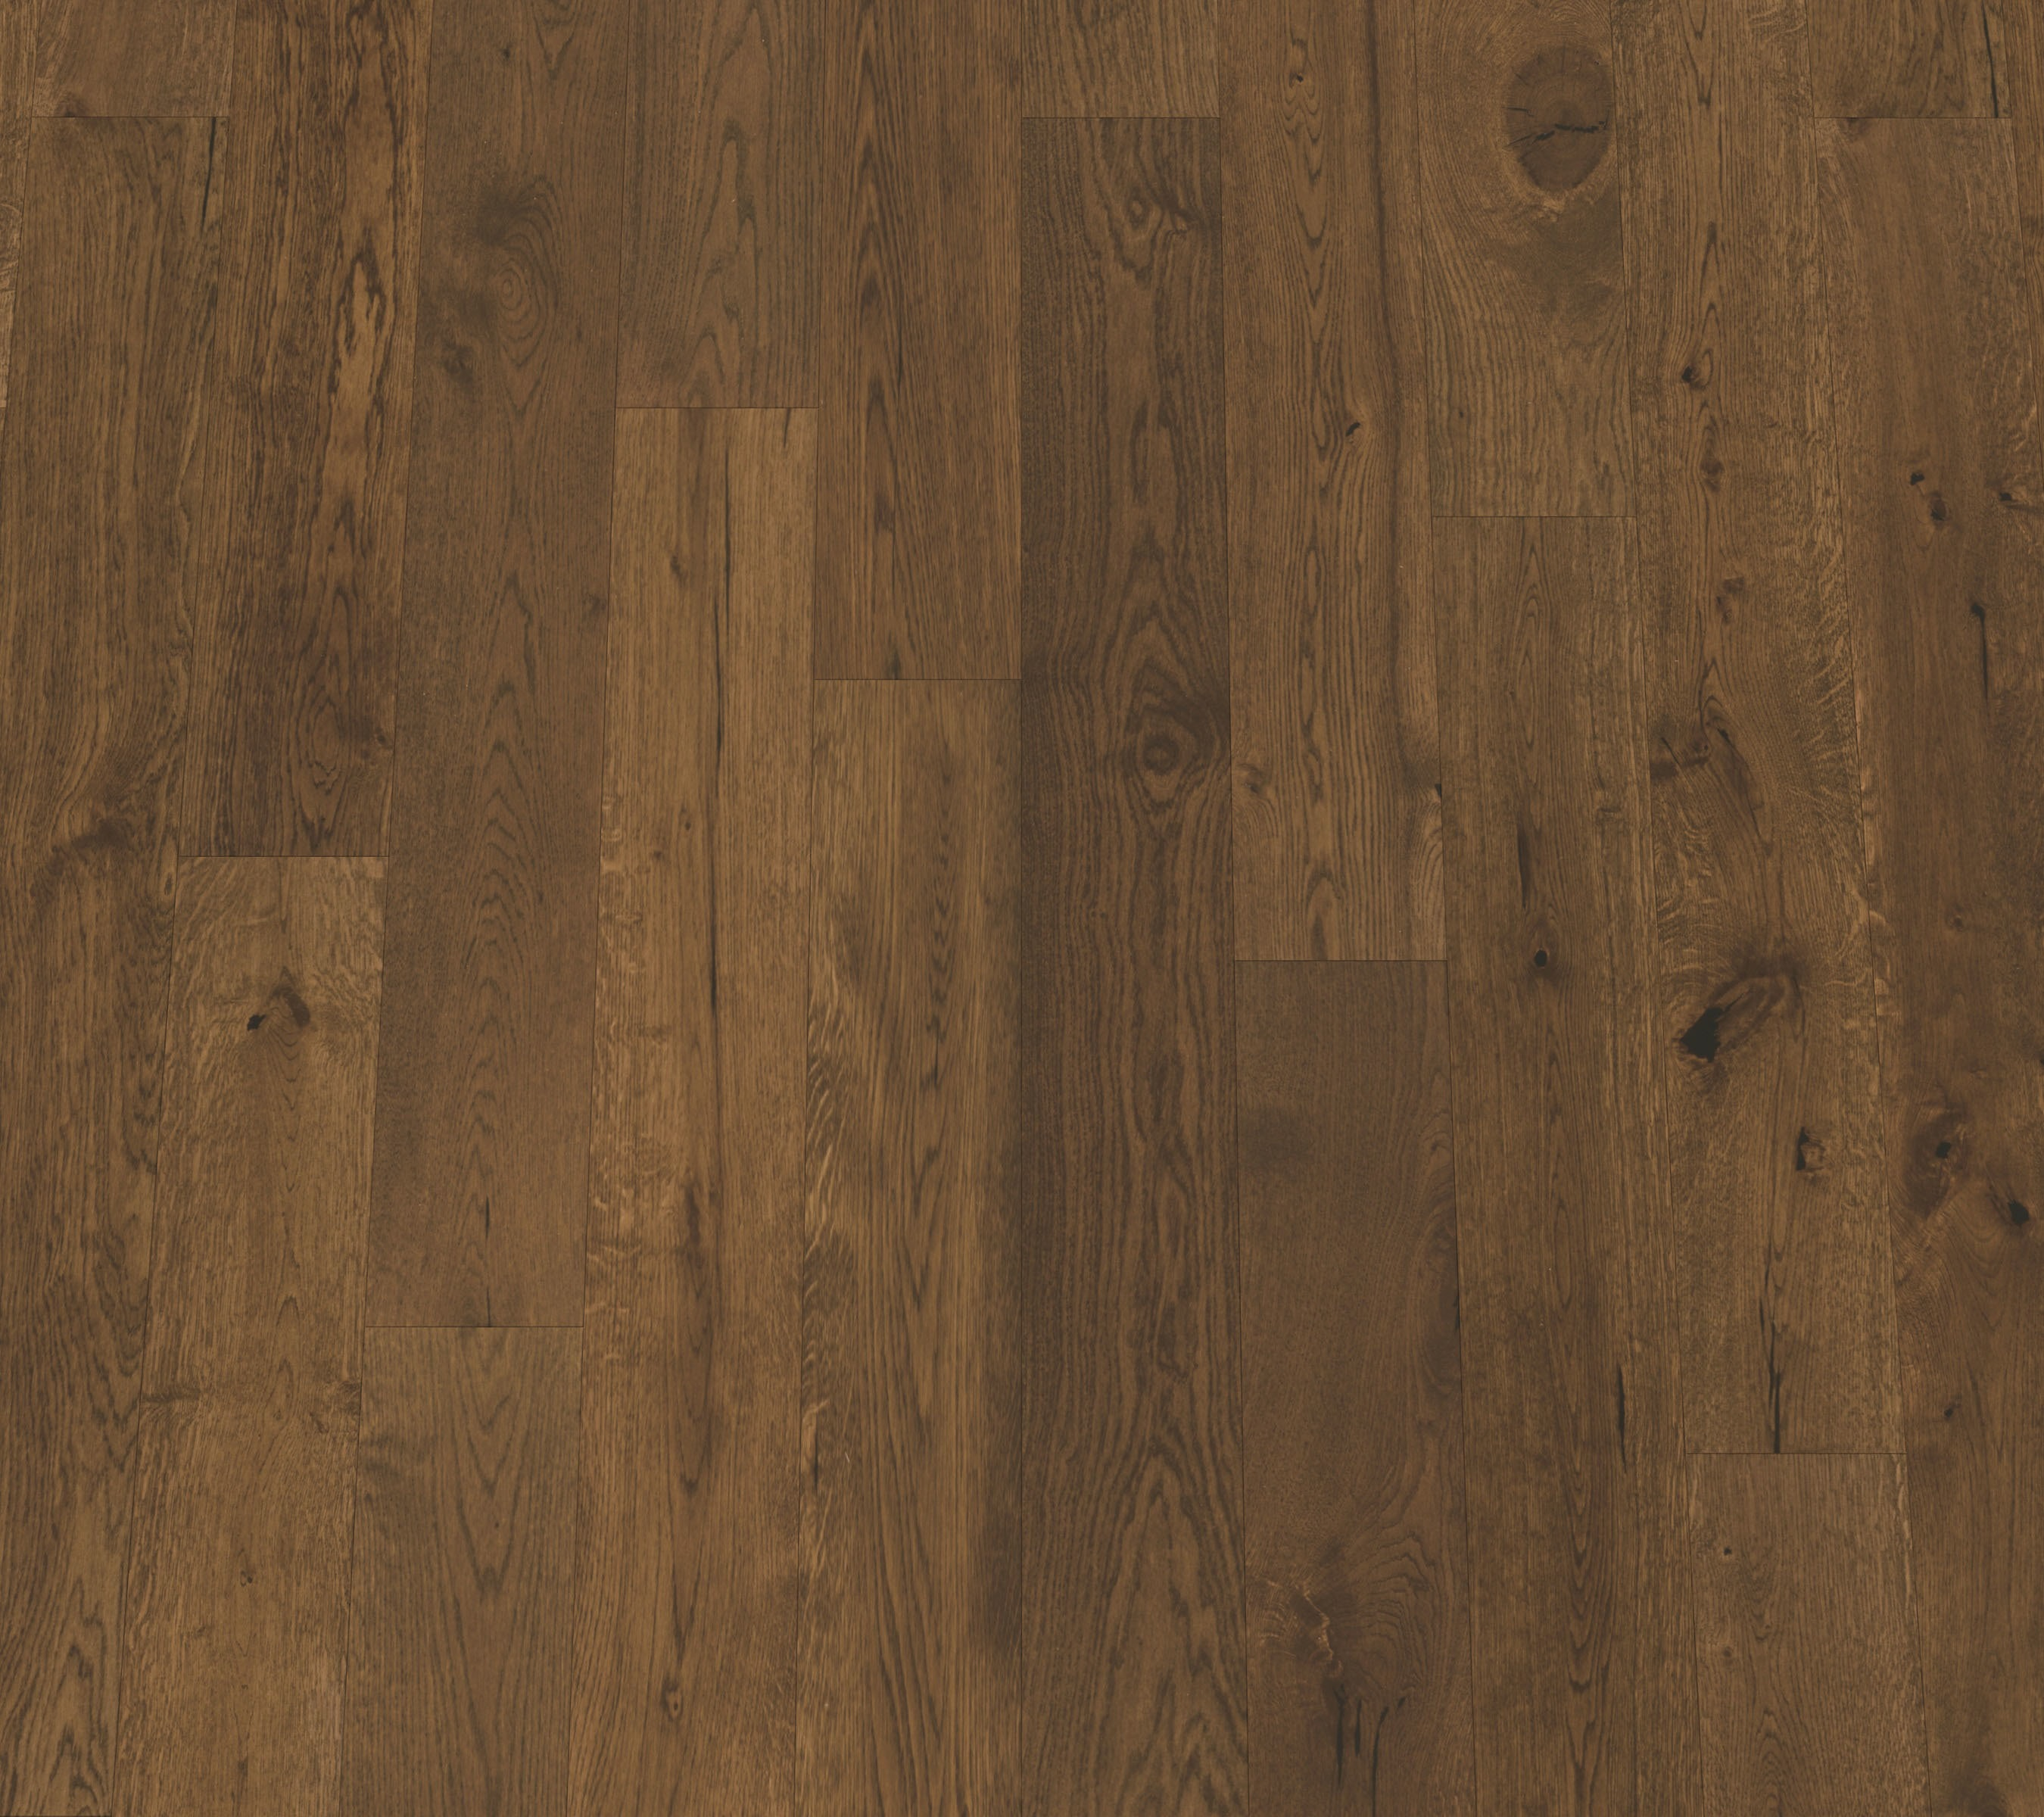 "Lisbon / White Oak / 9 Coats UV Aluminum Oxide / ABCDE / 3/8"" x 5"" x R.L. Big Ass Wood Floors - 1/2"" European Oak Collection 0"